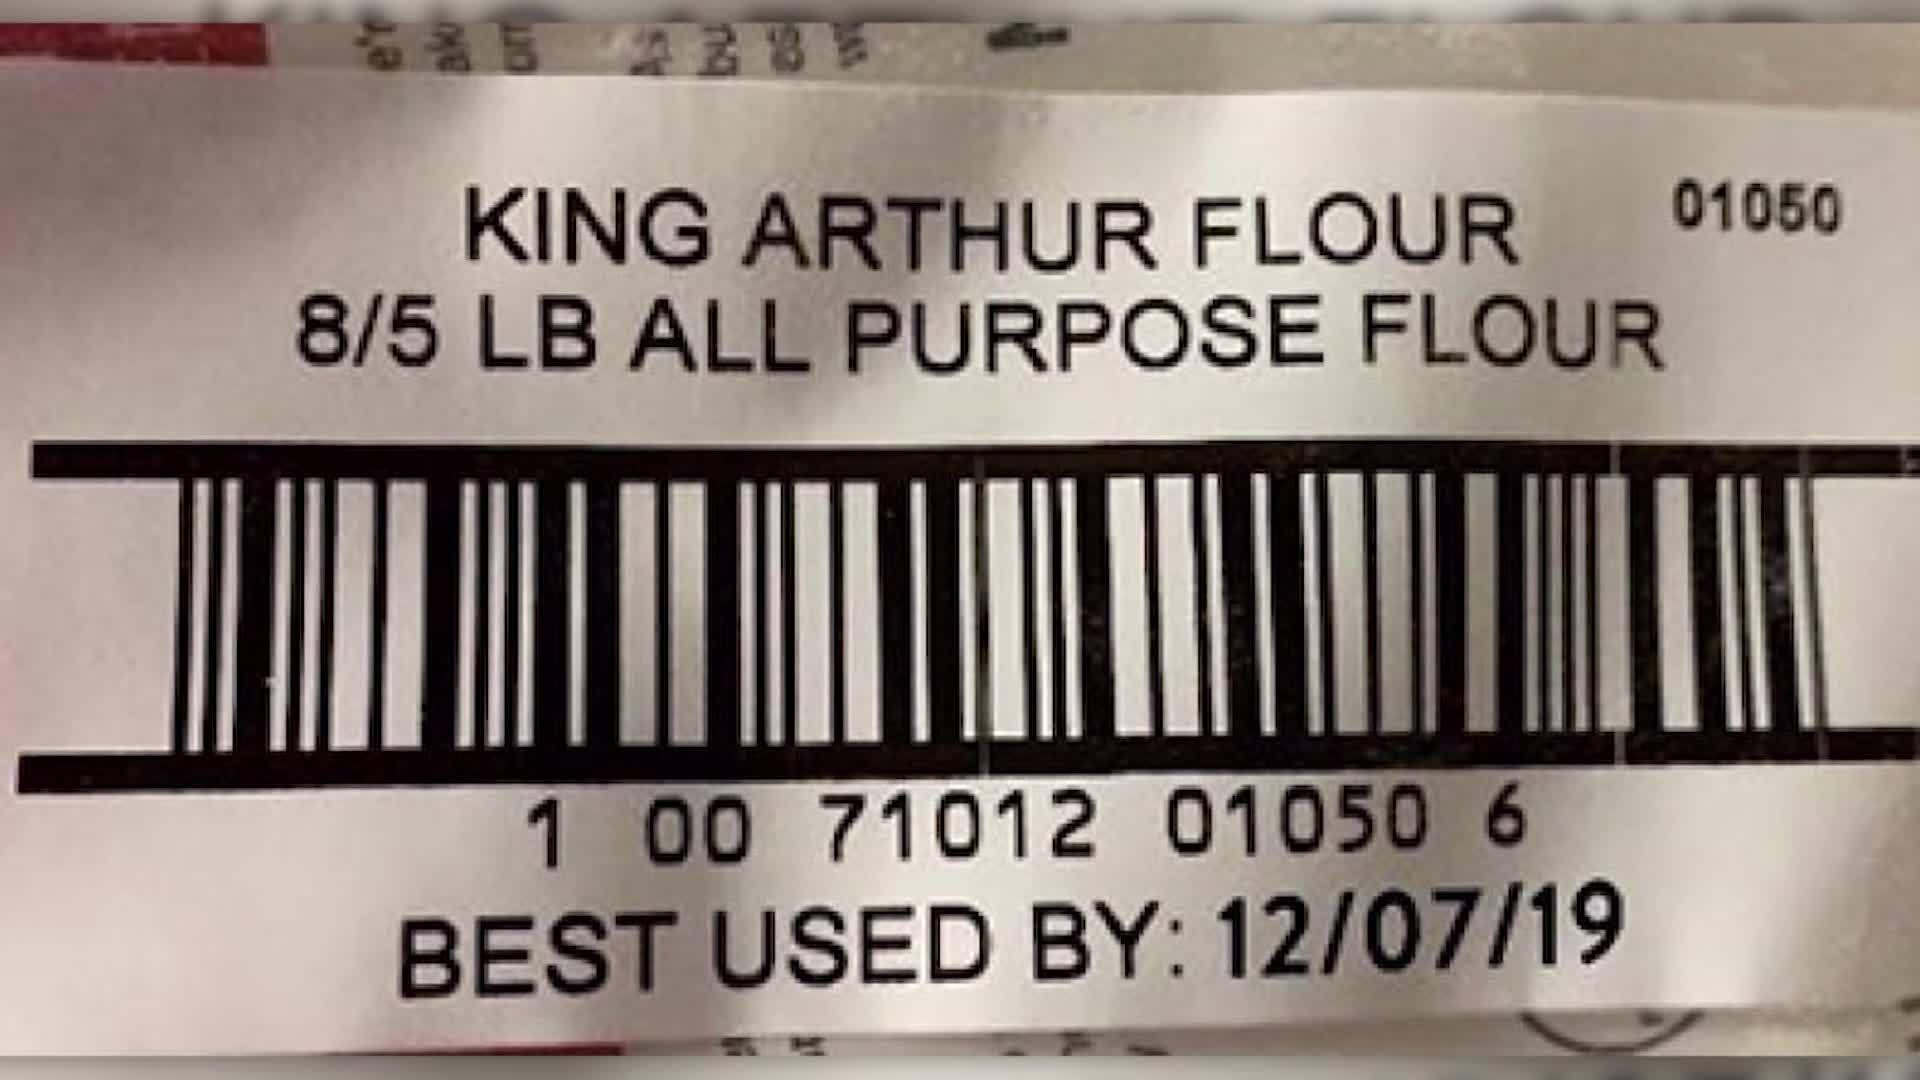 Over 14K cases of King Arthur flour recalled due to E. Coli contamination concerns